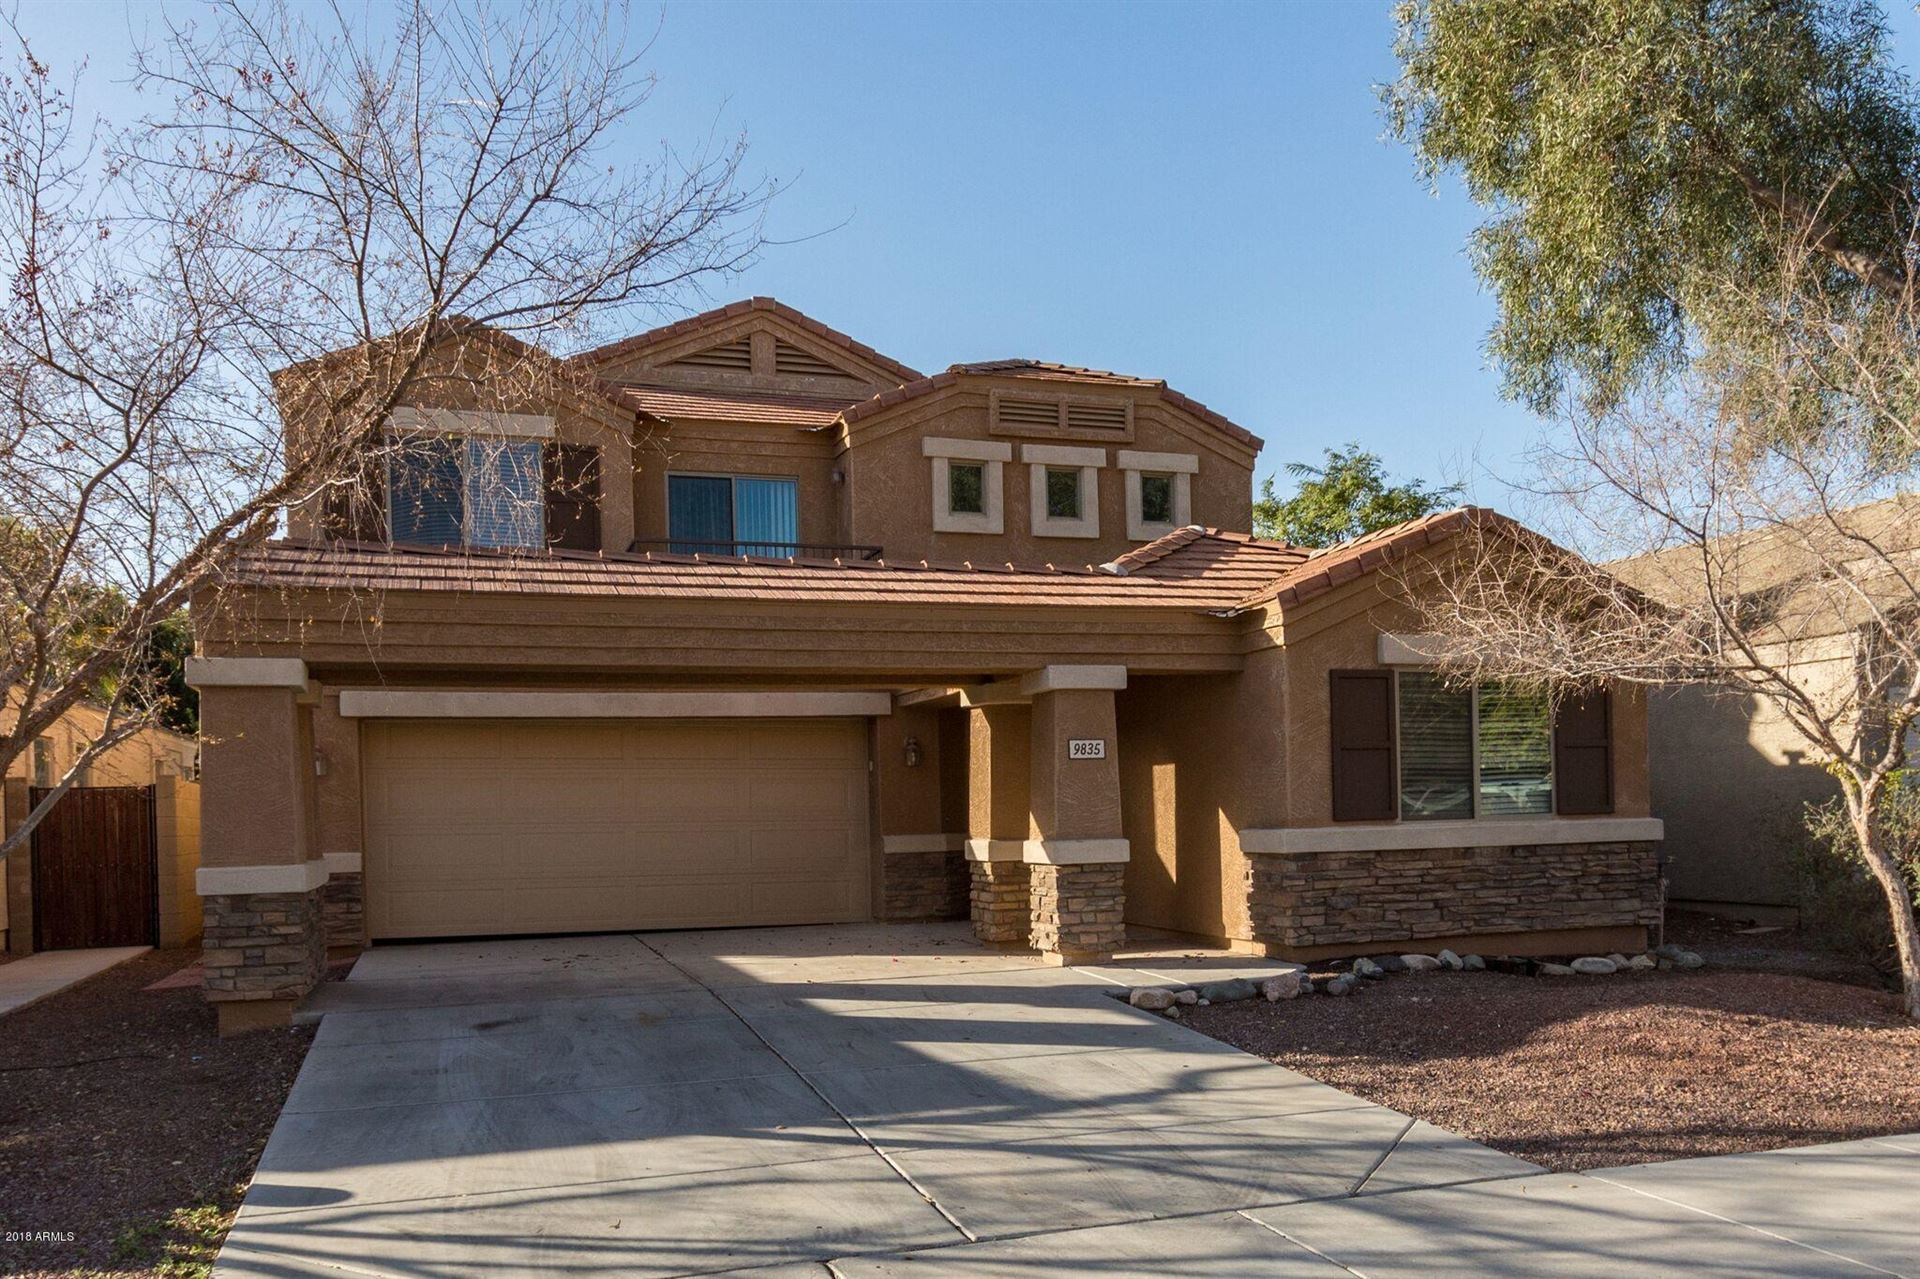 Photo of 9835 W SALTER Drive, Peoria, AZ 85382 (MLS # 6249579)